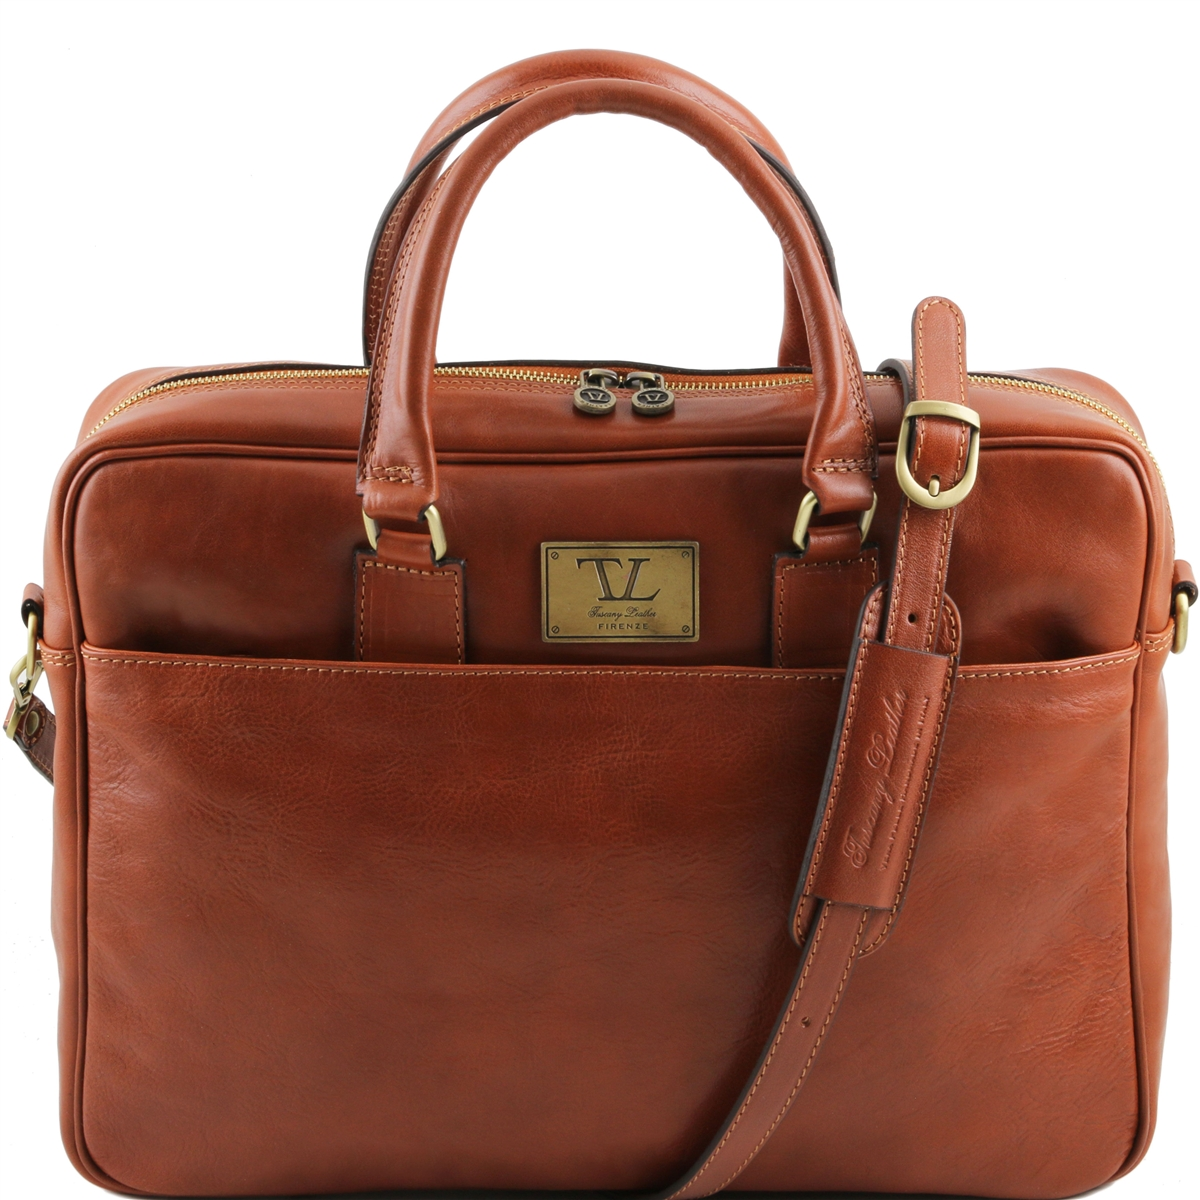 leather laptop bag tuscany leather tl141241 urbino laptop bag - honey wtnathy